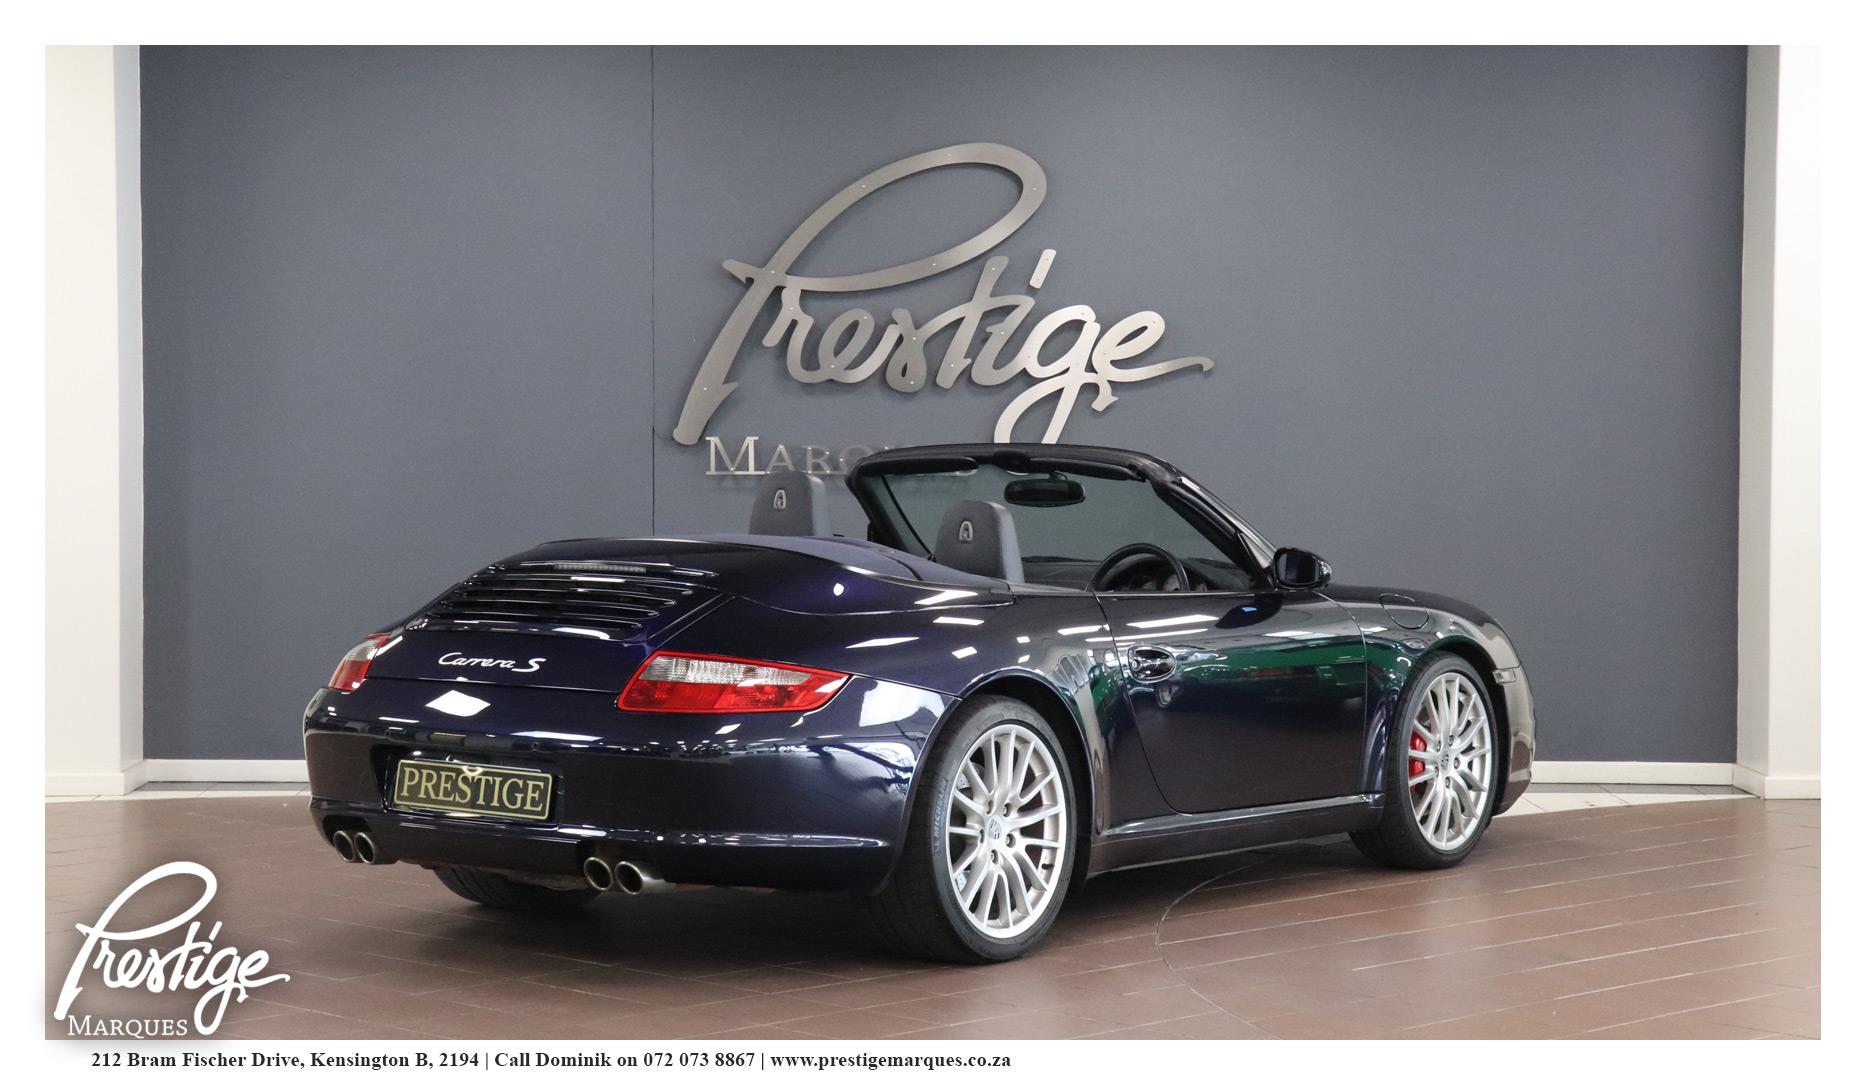 2005-Porsche-911-997-Carrera-S-Cabriolet-Tiptronic-Prestige-Marques-Randburg-Sandton-6